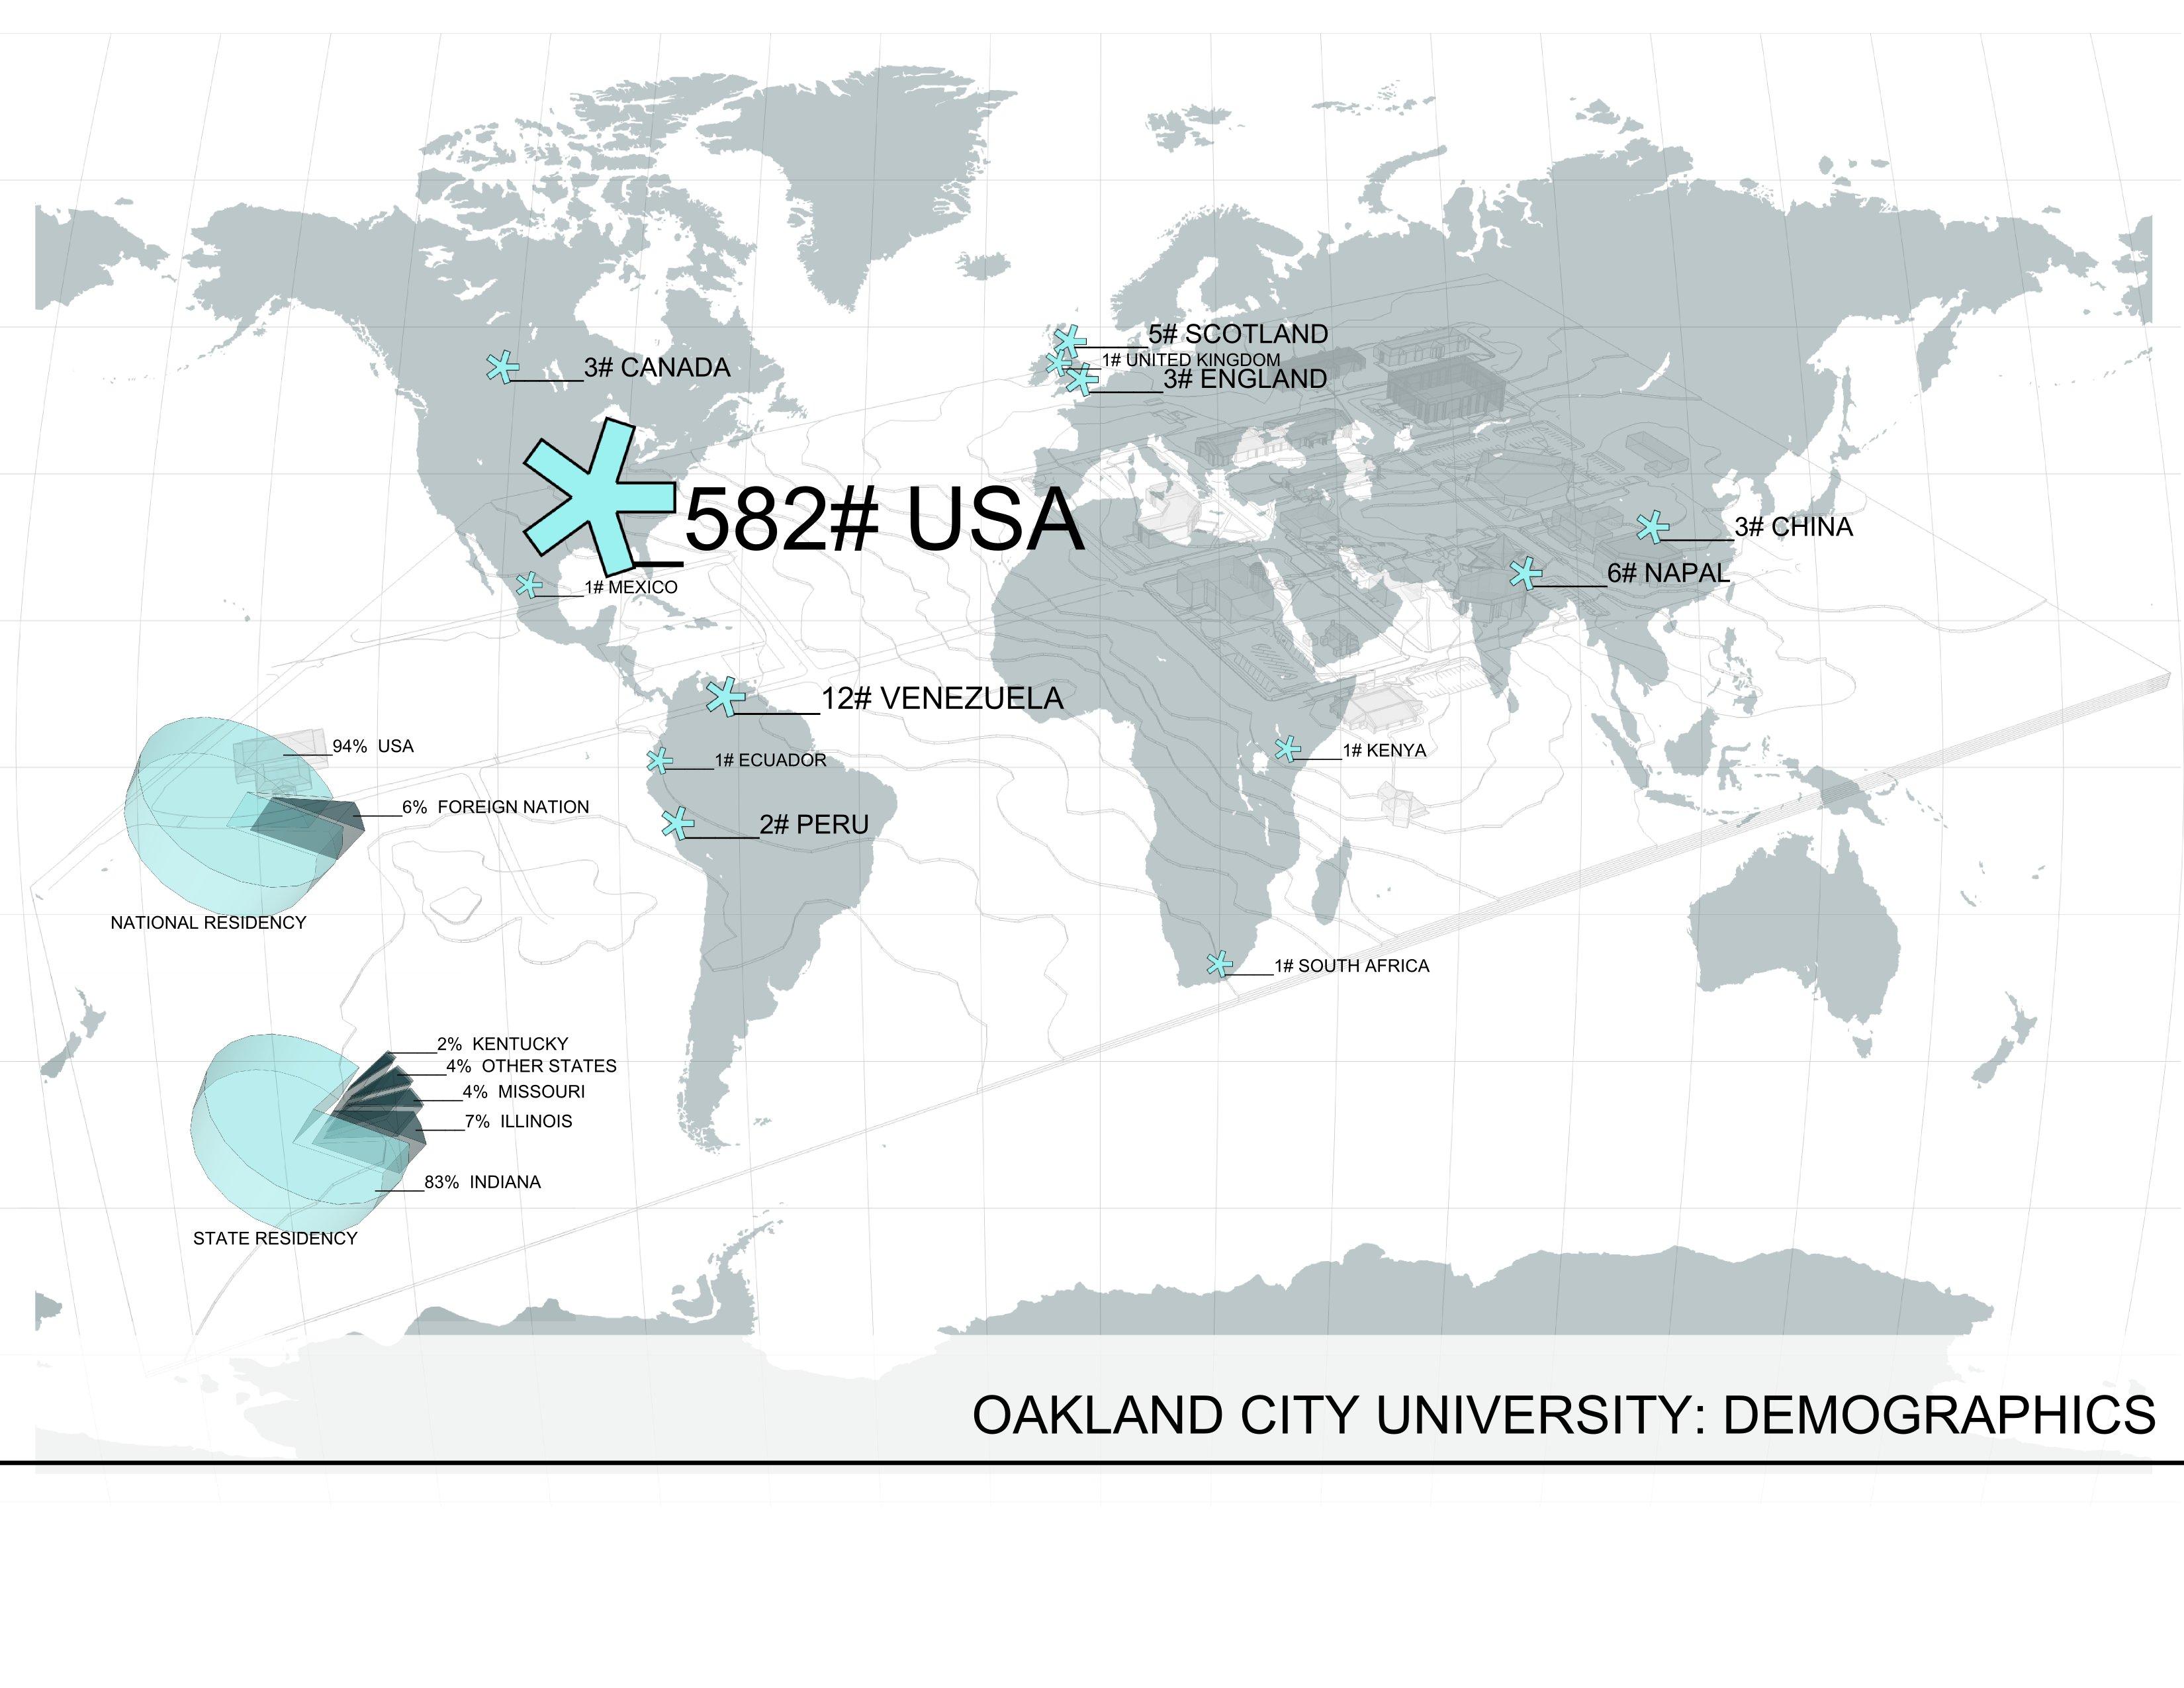 OCU_demographics_map_layout_6d_no_land_a